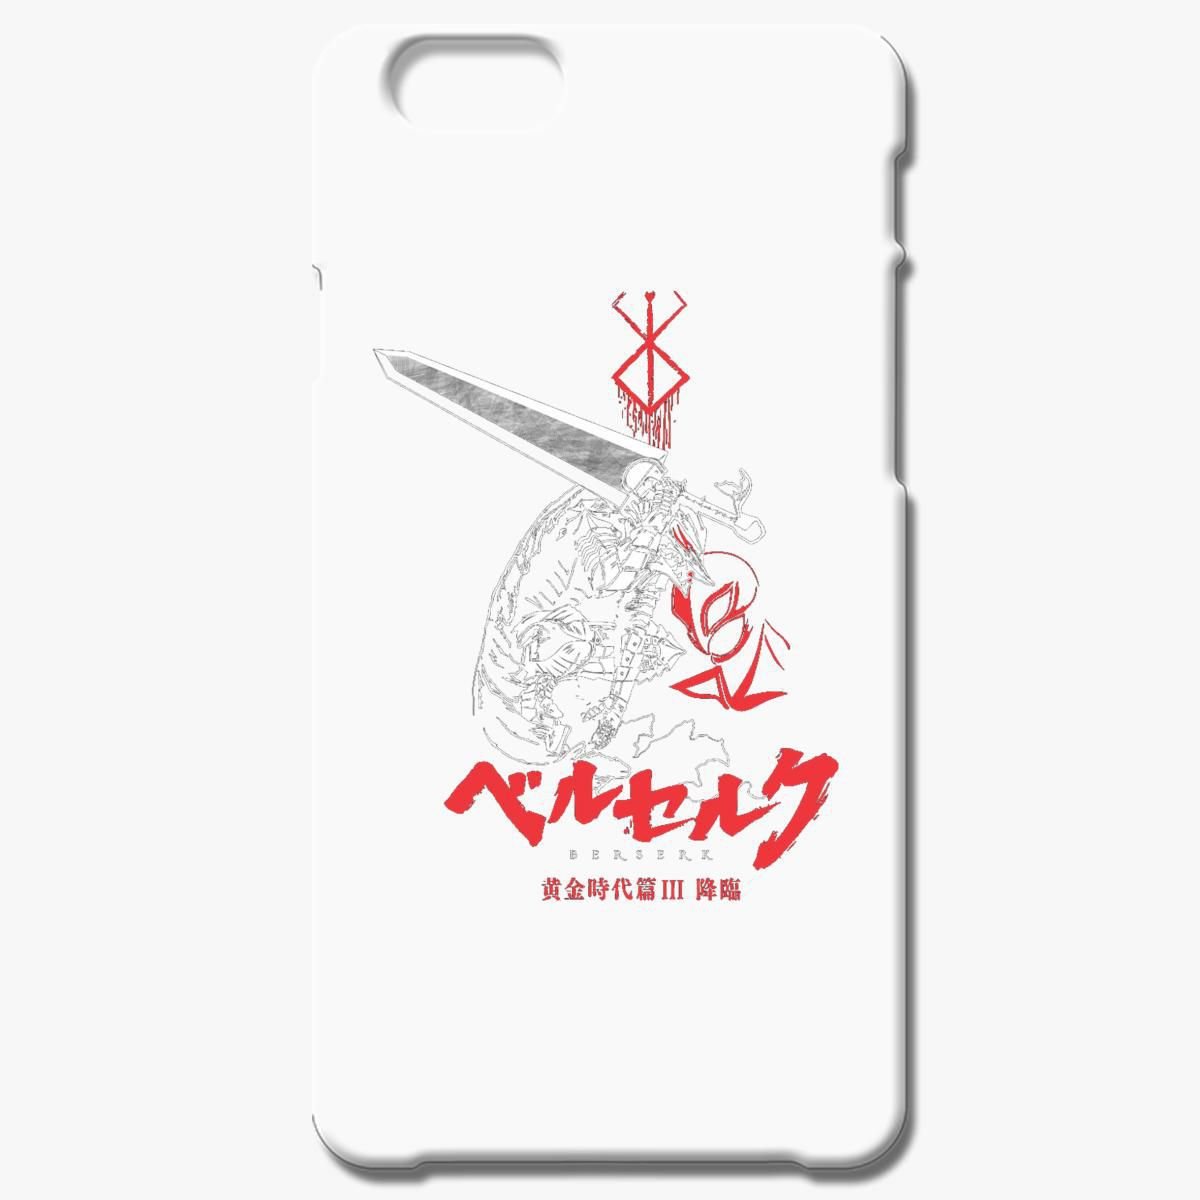 Berserk Iphone 6 6s Plus Case